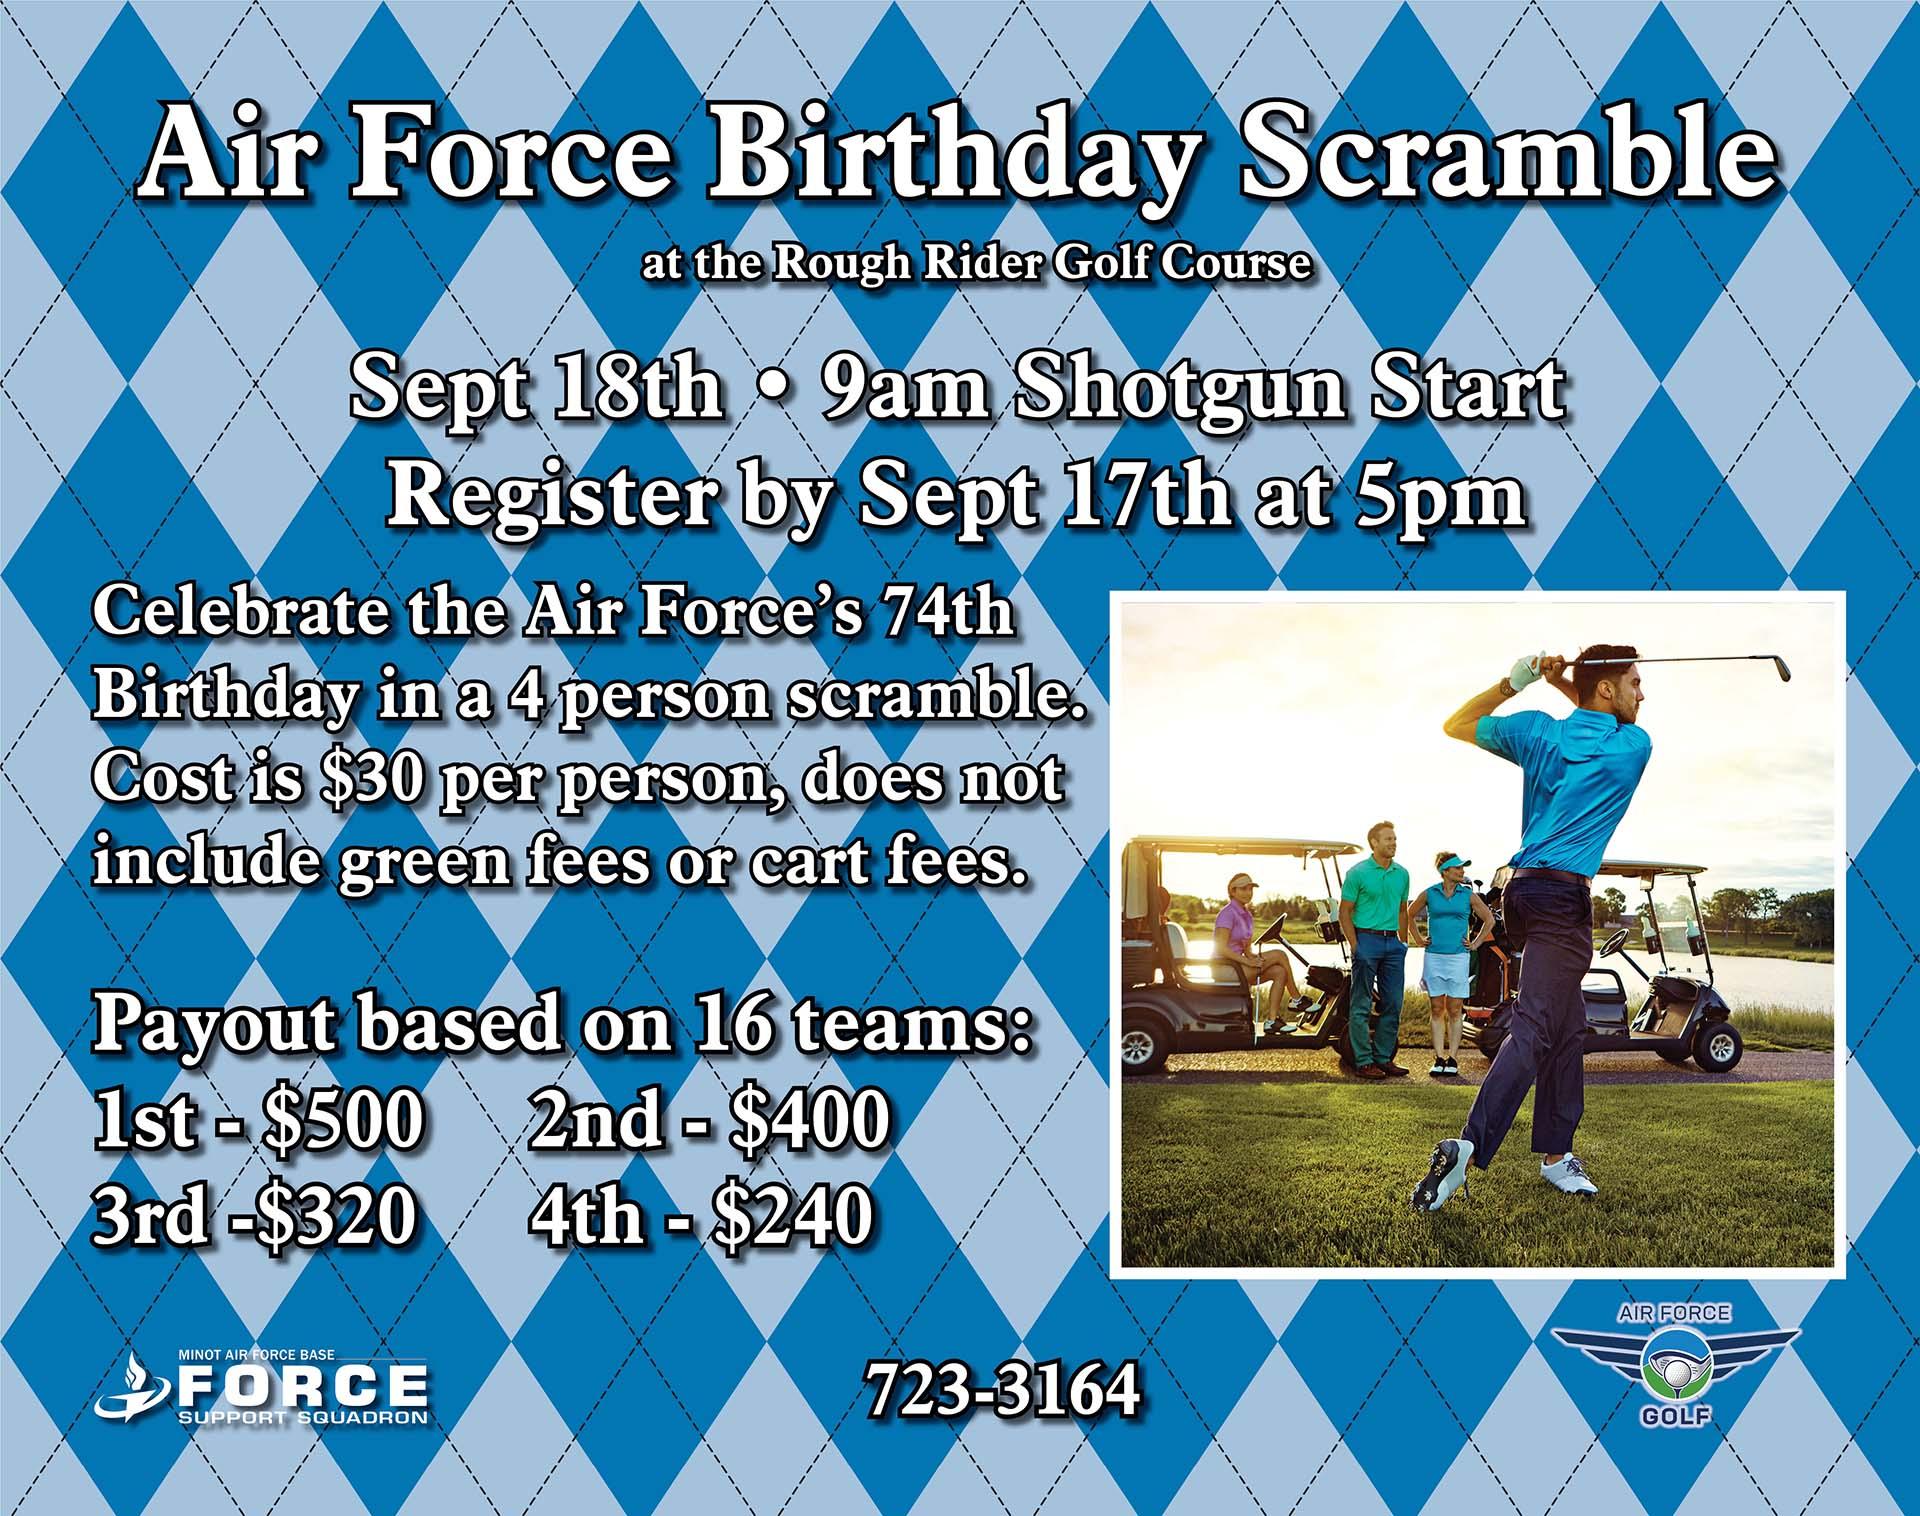 Air Force Birthday Scramble